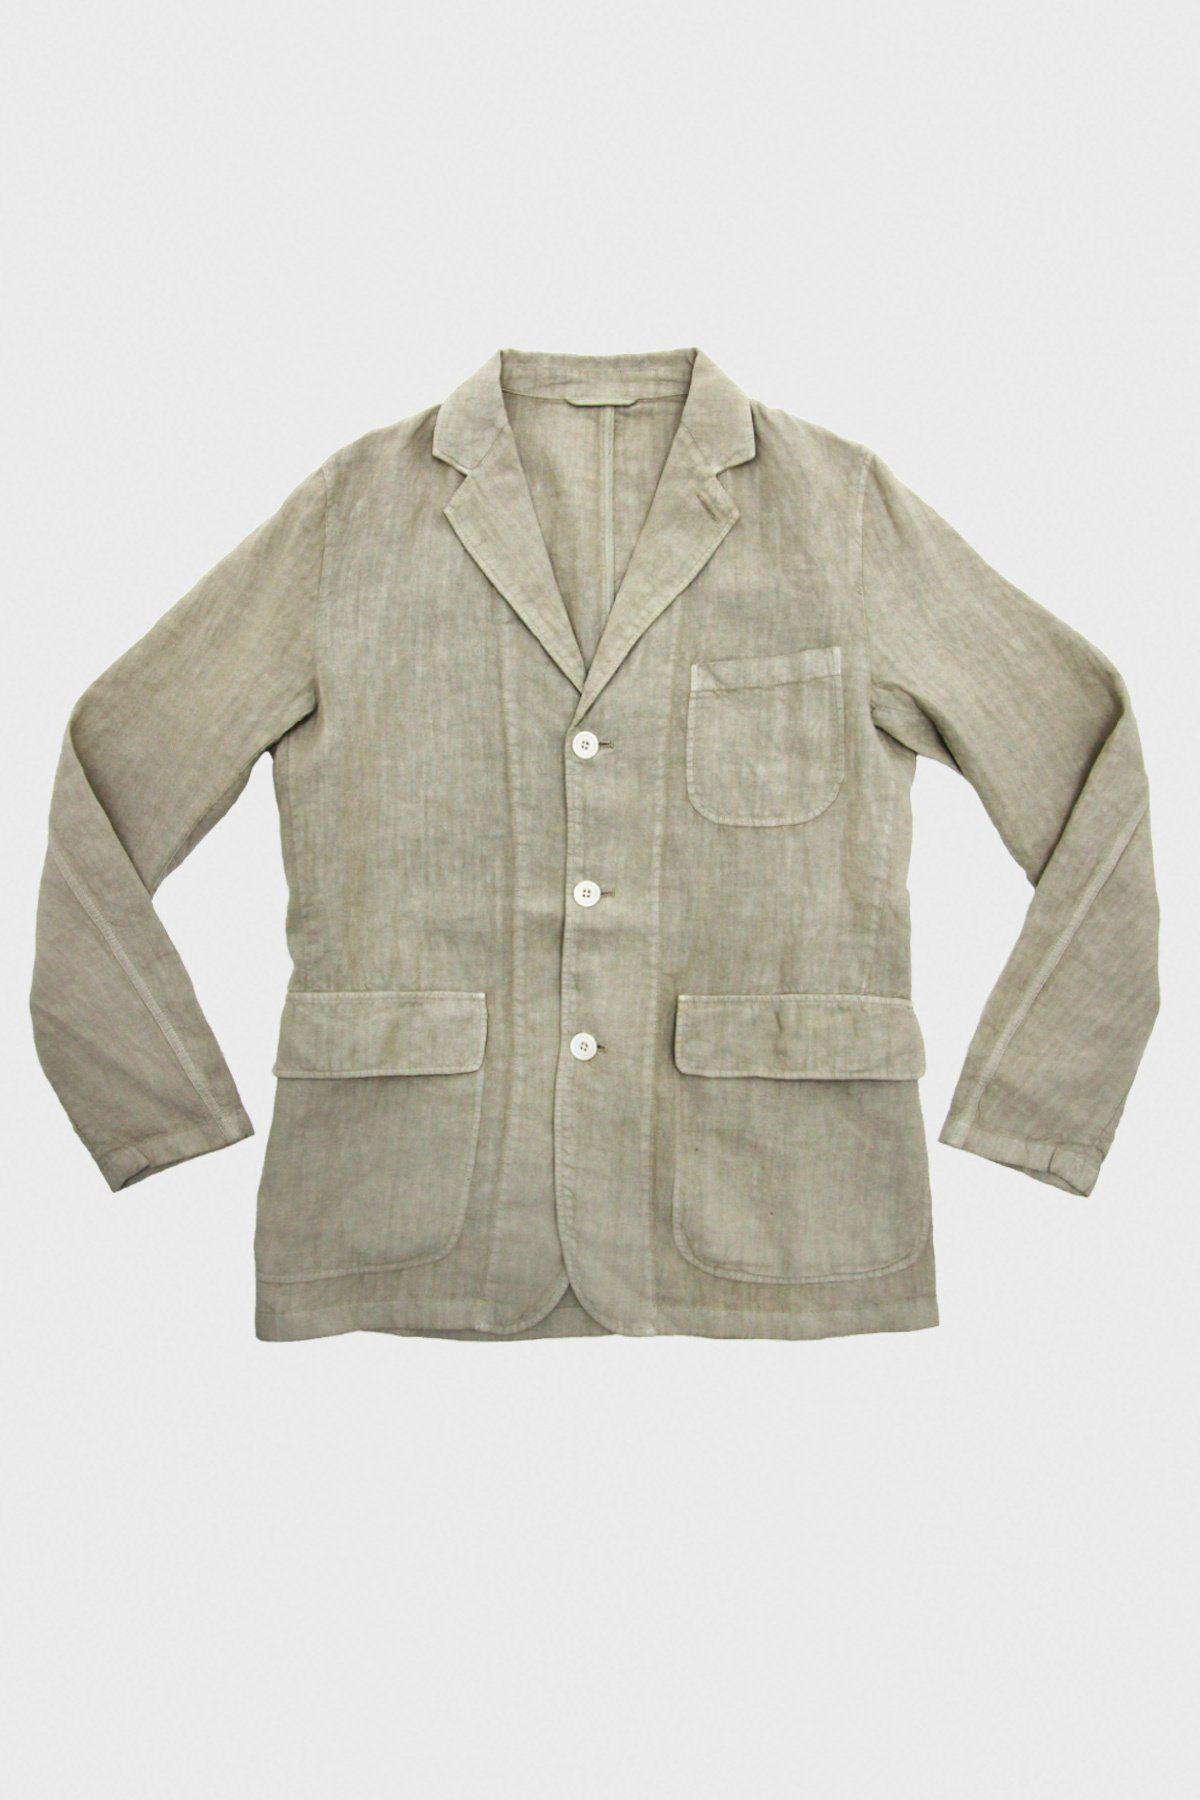 Jag Jacket - Khaki - S in 2019  08202e8e9bdf9